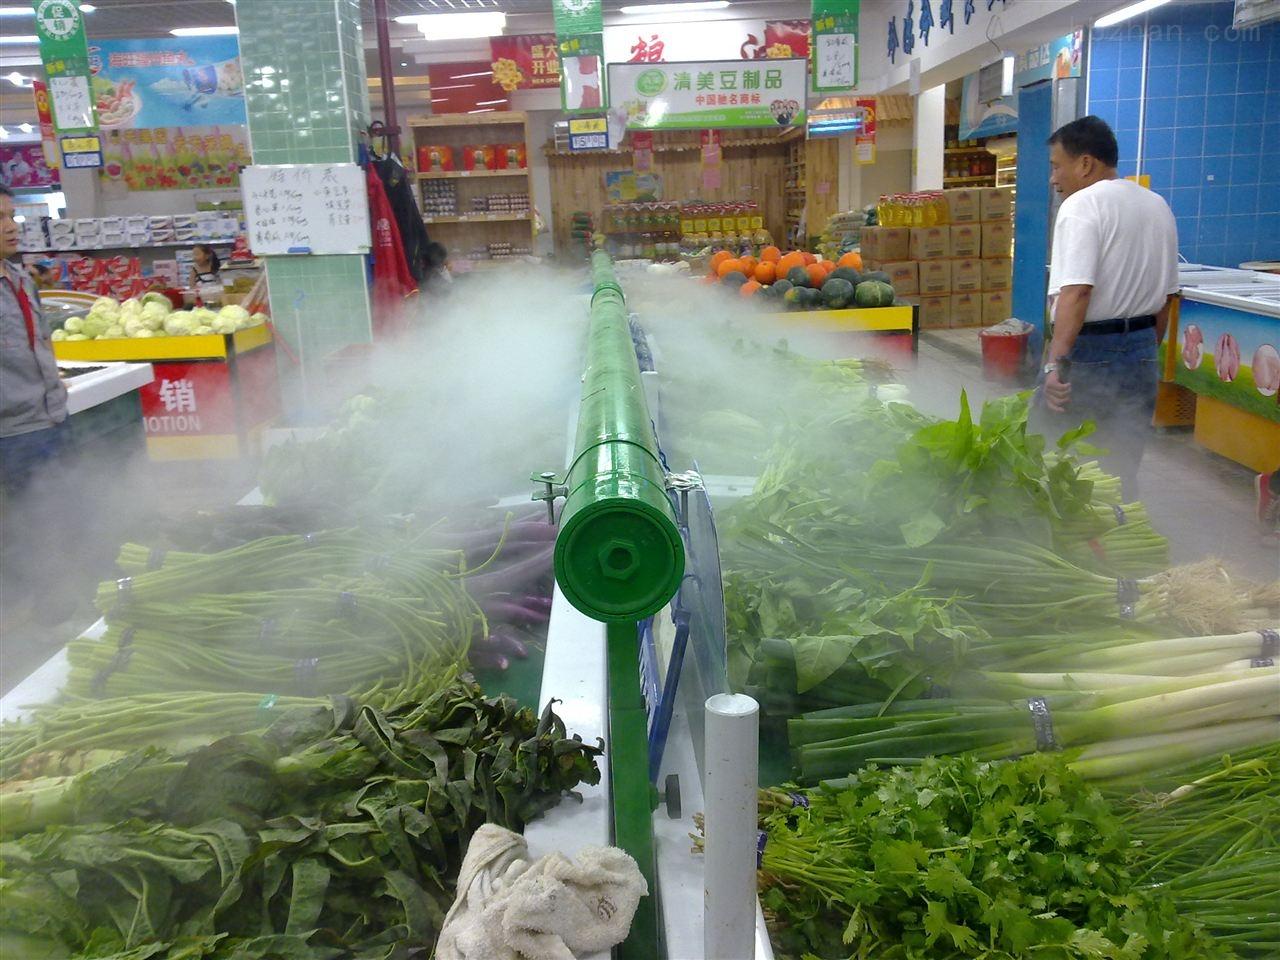 jjc系列 上海集佳 蔬菜保鲜加湿器